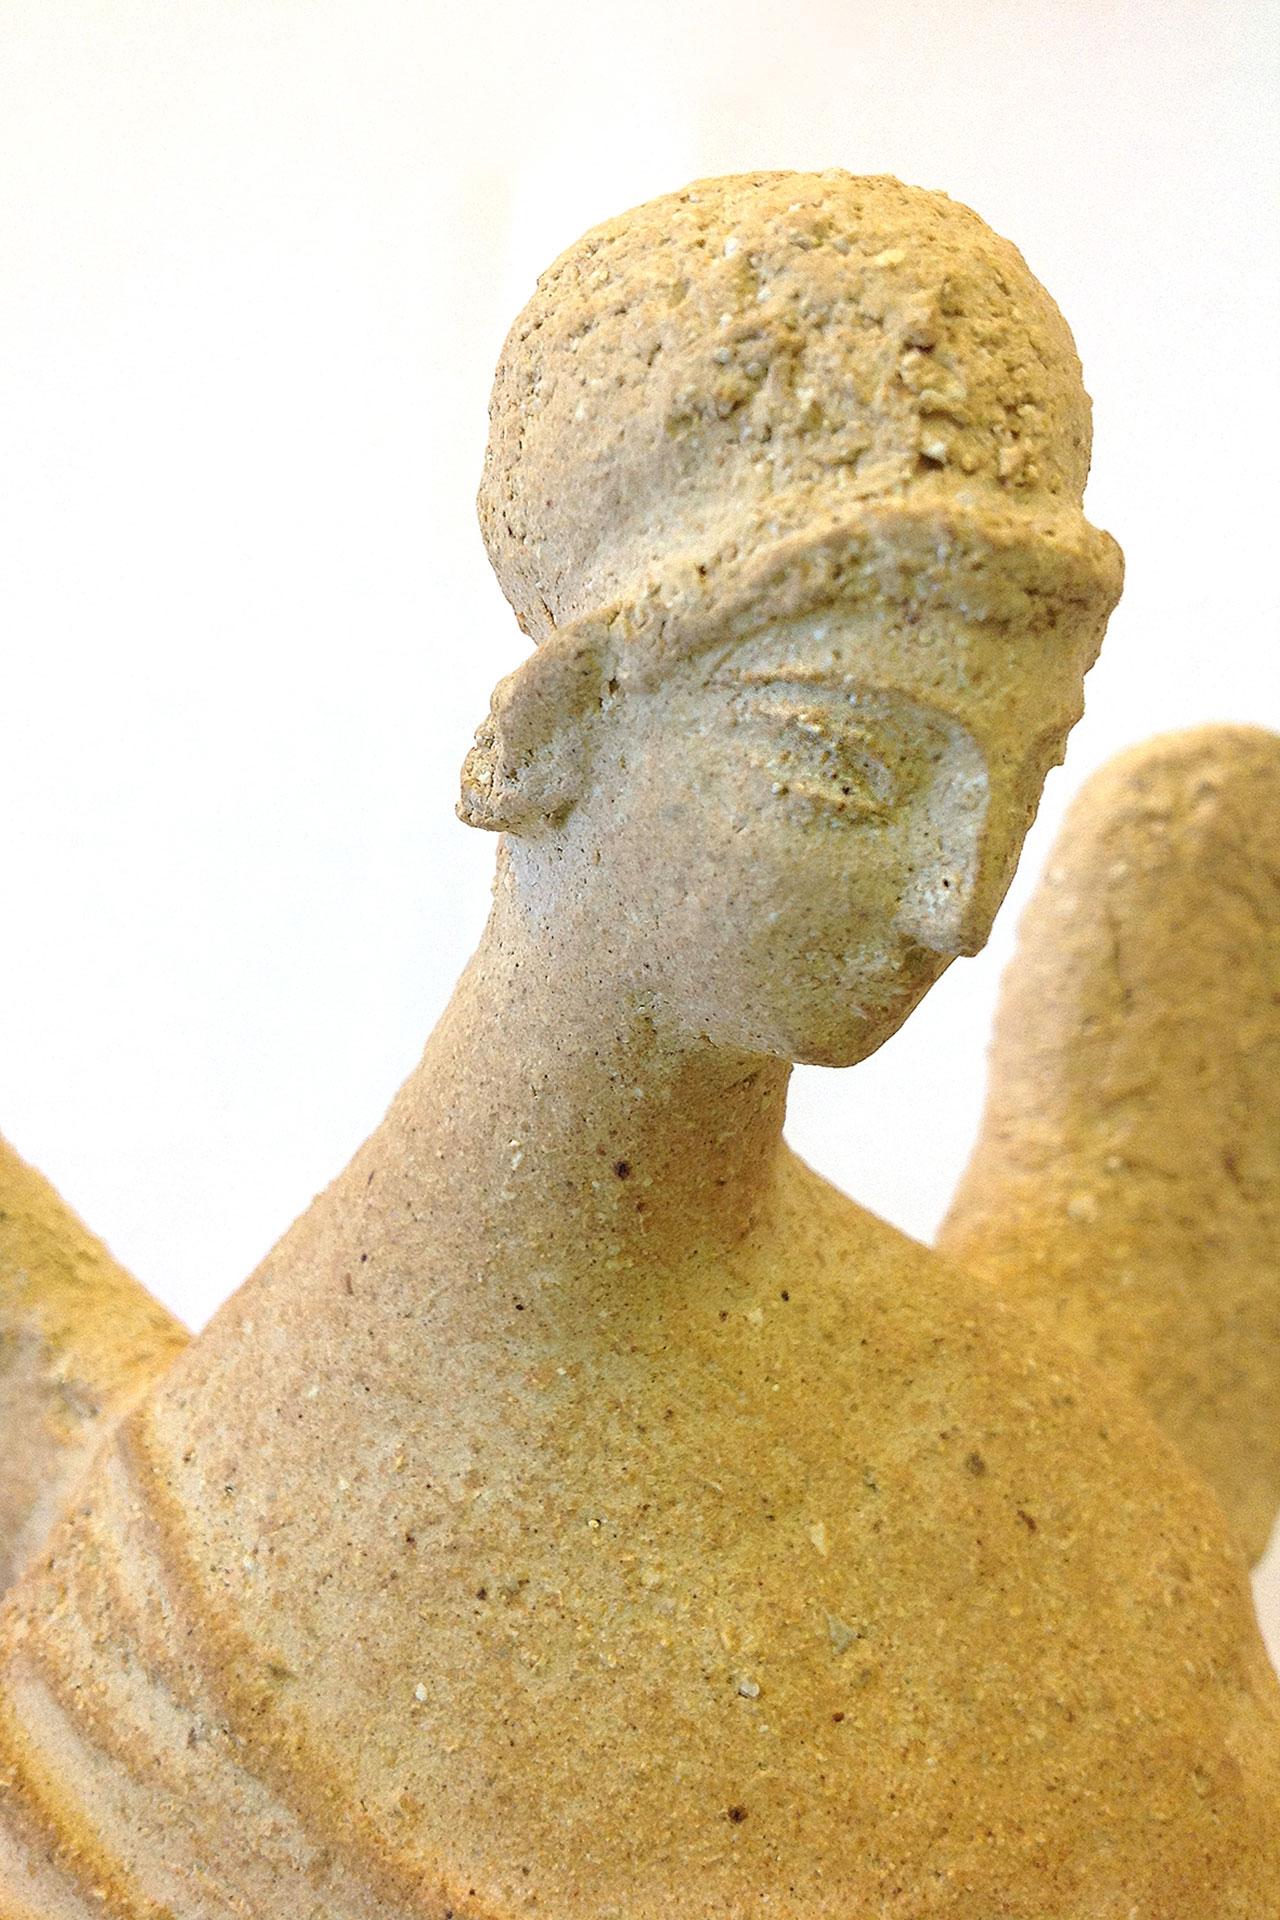 Скульптура из шамота Натальи Чепкасовой